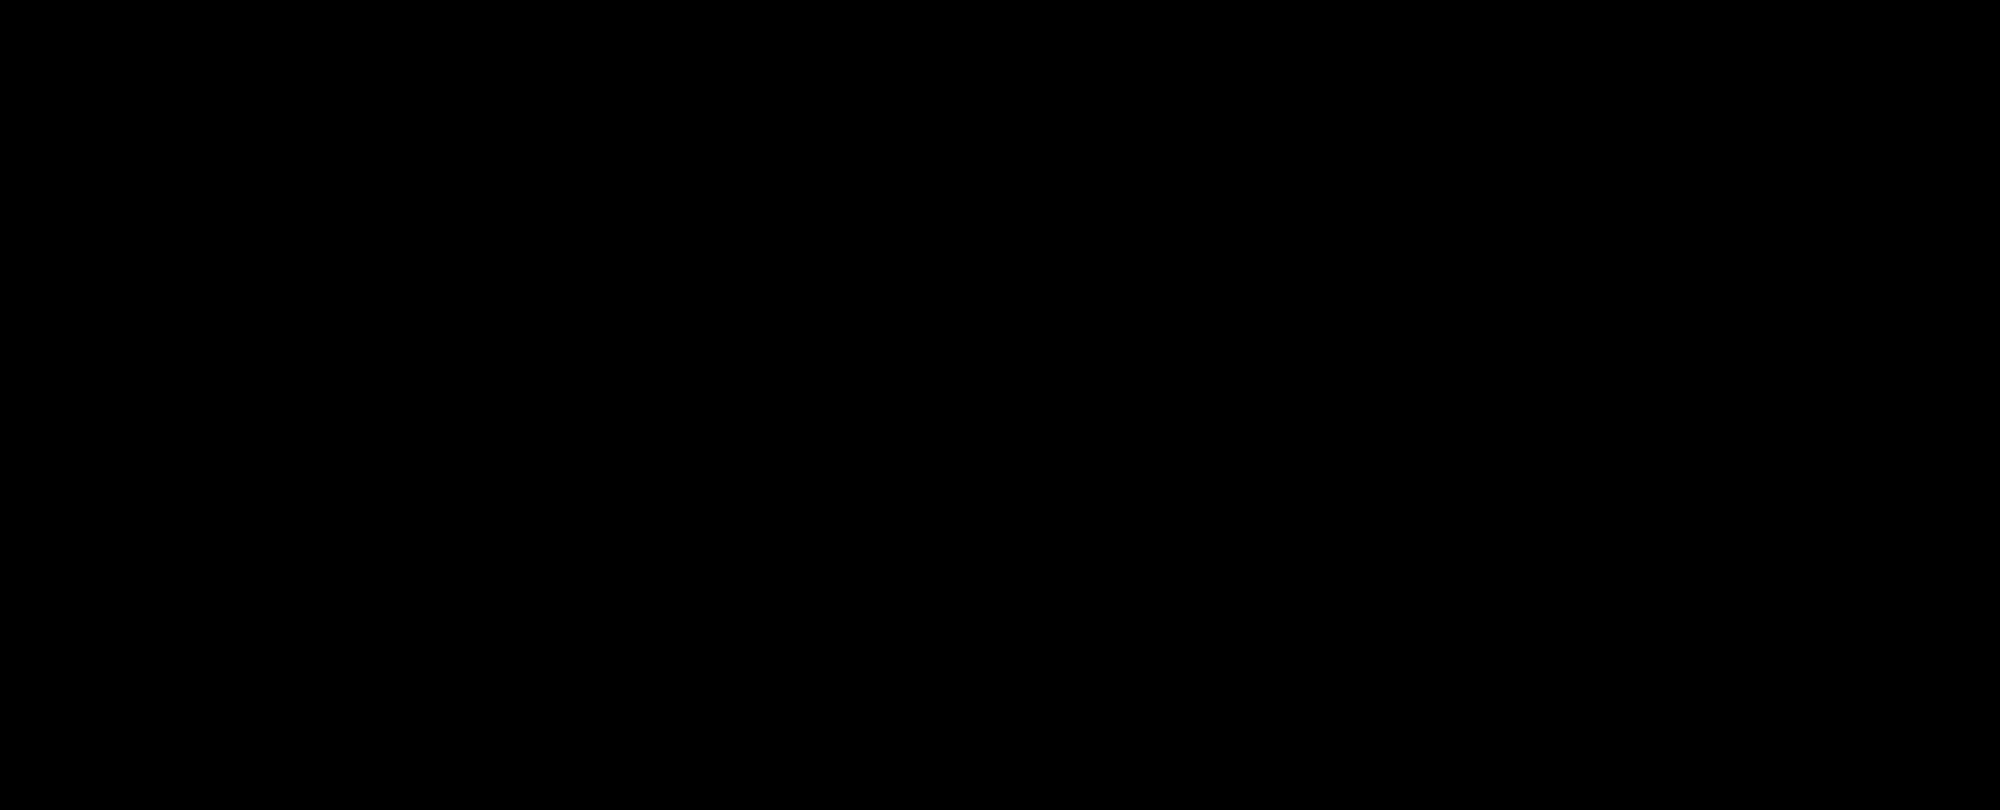 THE-logo-black.png